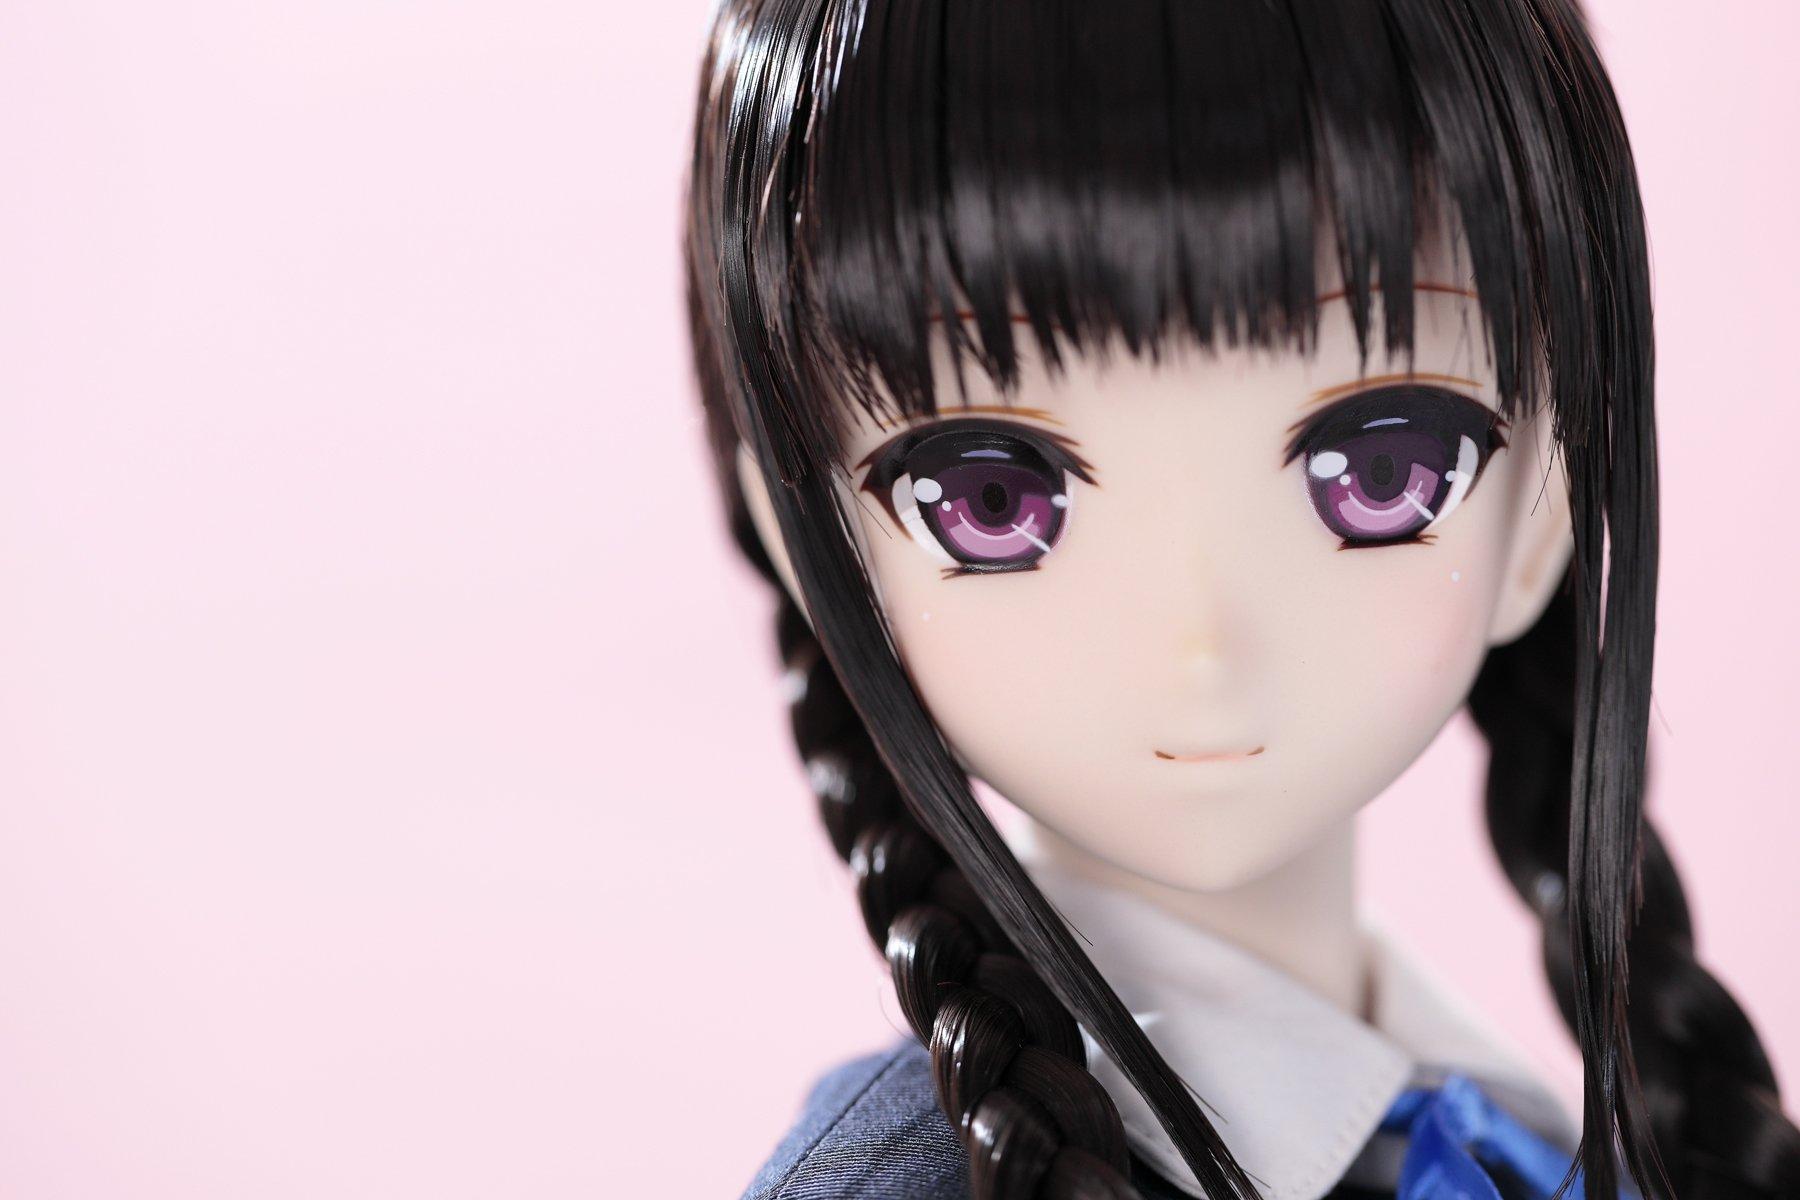 [Azone] 1/3 Happiness Clover - Yukari - Kazuharu Kina School Uniform Collection  Img_2077